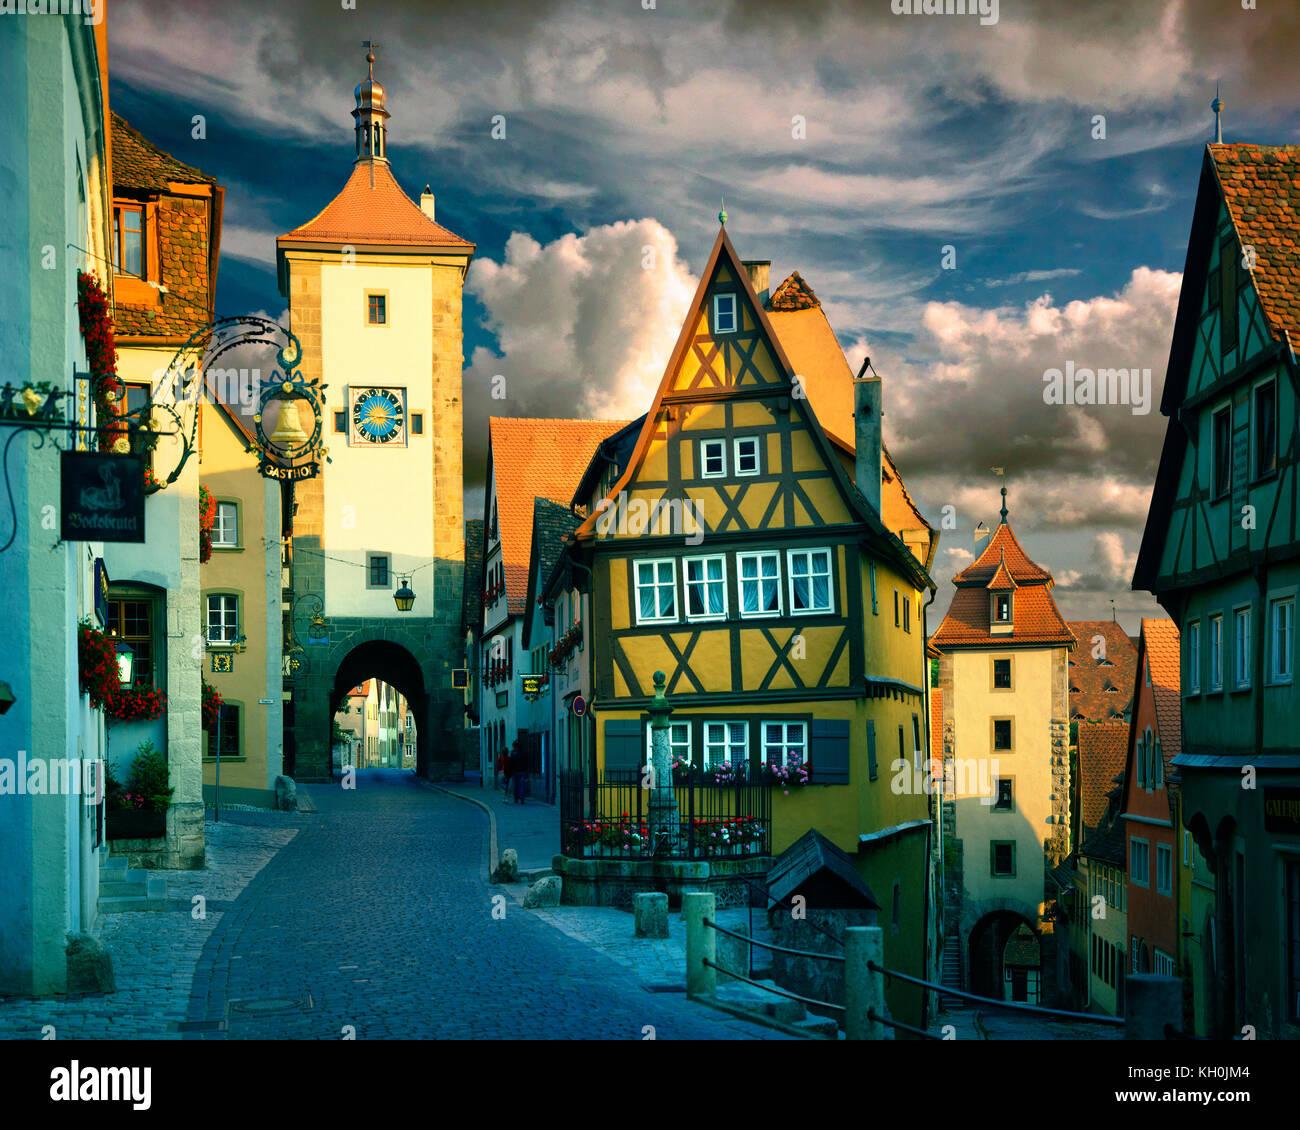 DE - BAVARIA: Ploenlein Gate at Rothenburg-ob-der-Tauber - Stock Image